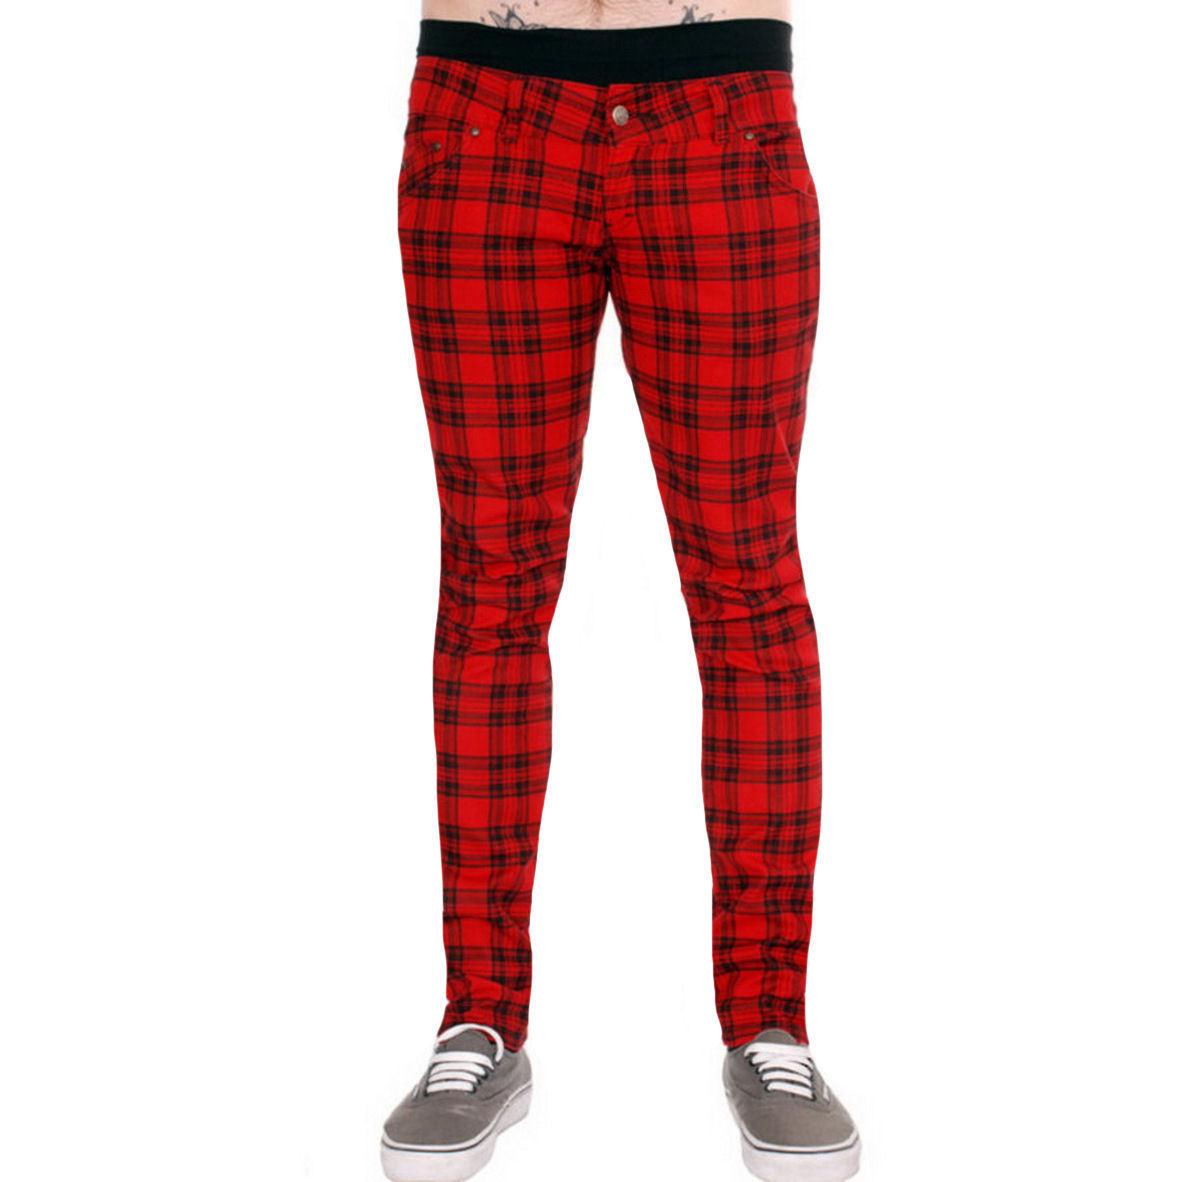 kalhoty pánské 3RDAND56th - Checked - Black/Red - JM1455